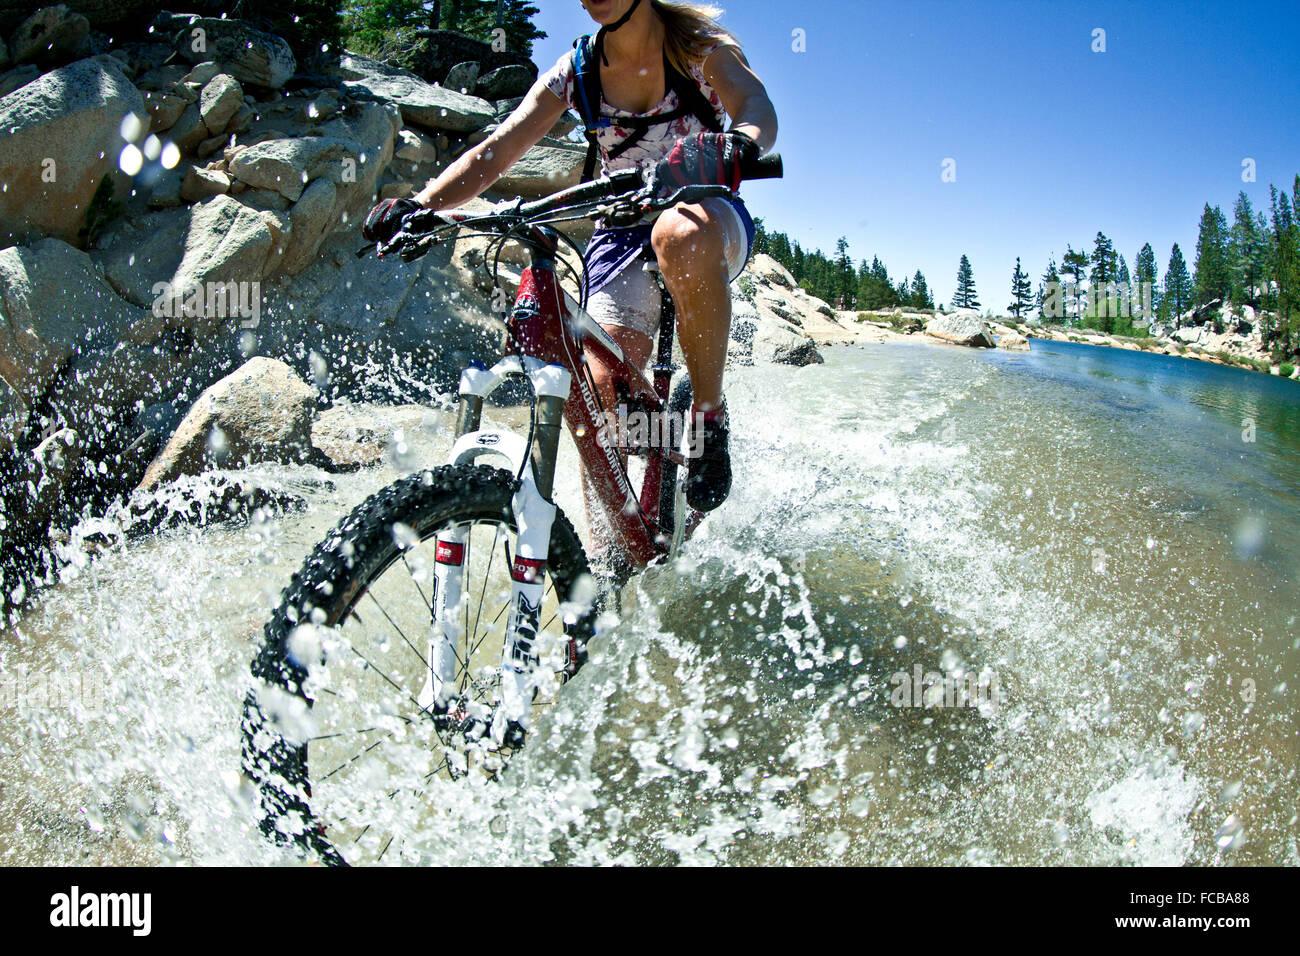 Mountain Biking on Flume Trail, Tahoe, CA Stock Photo